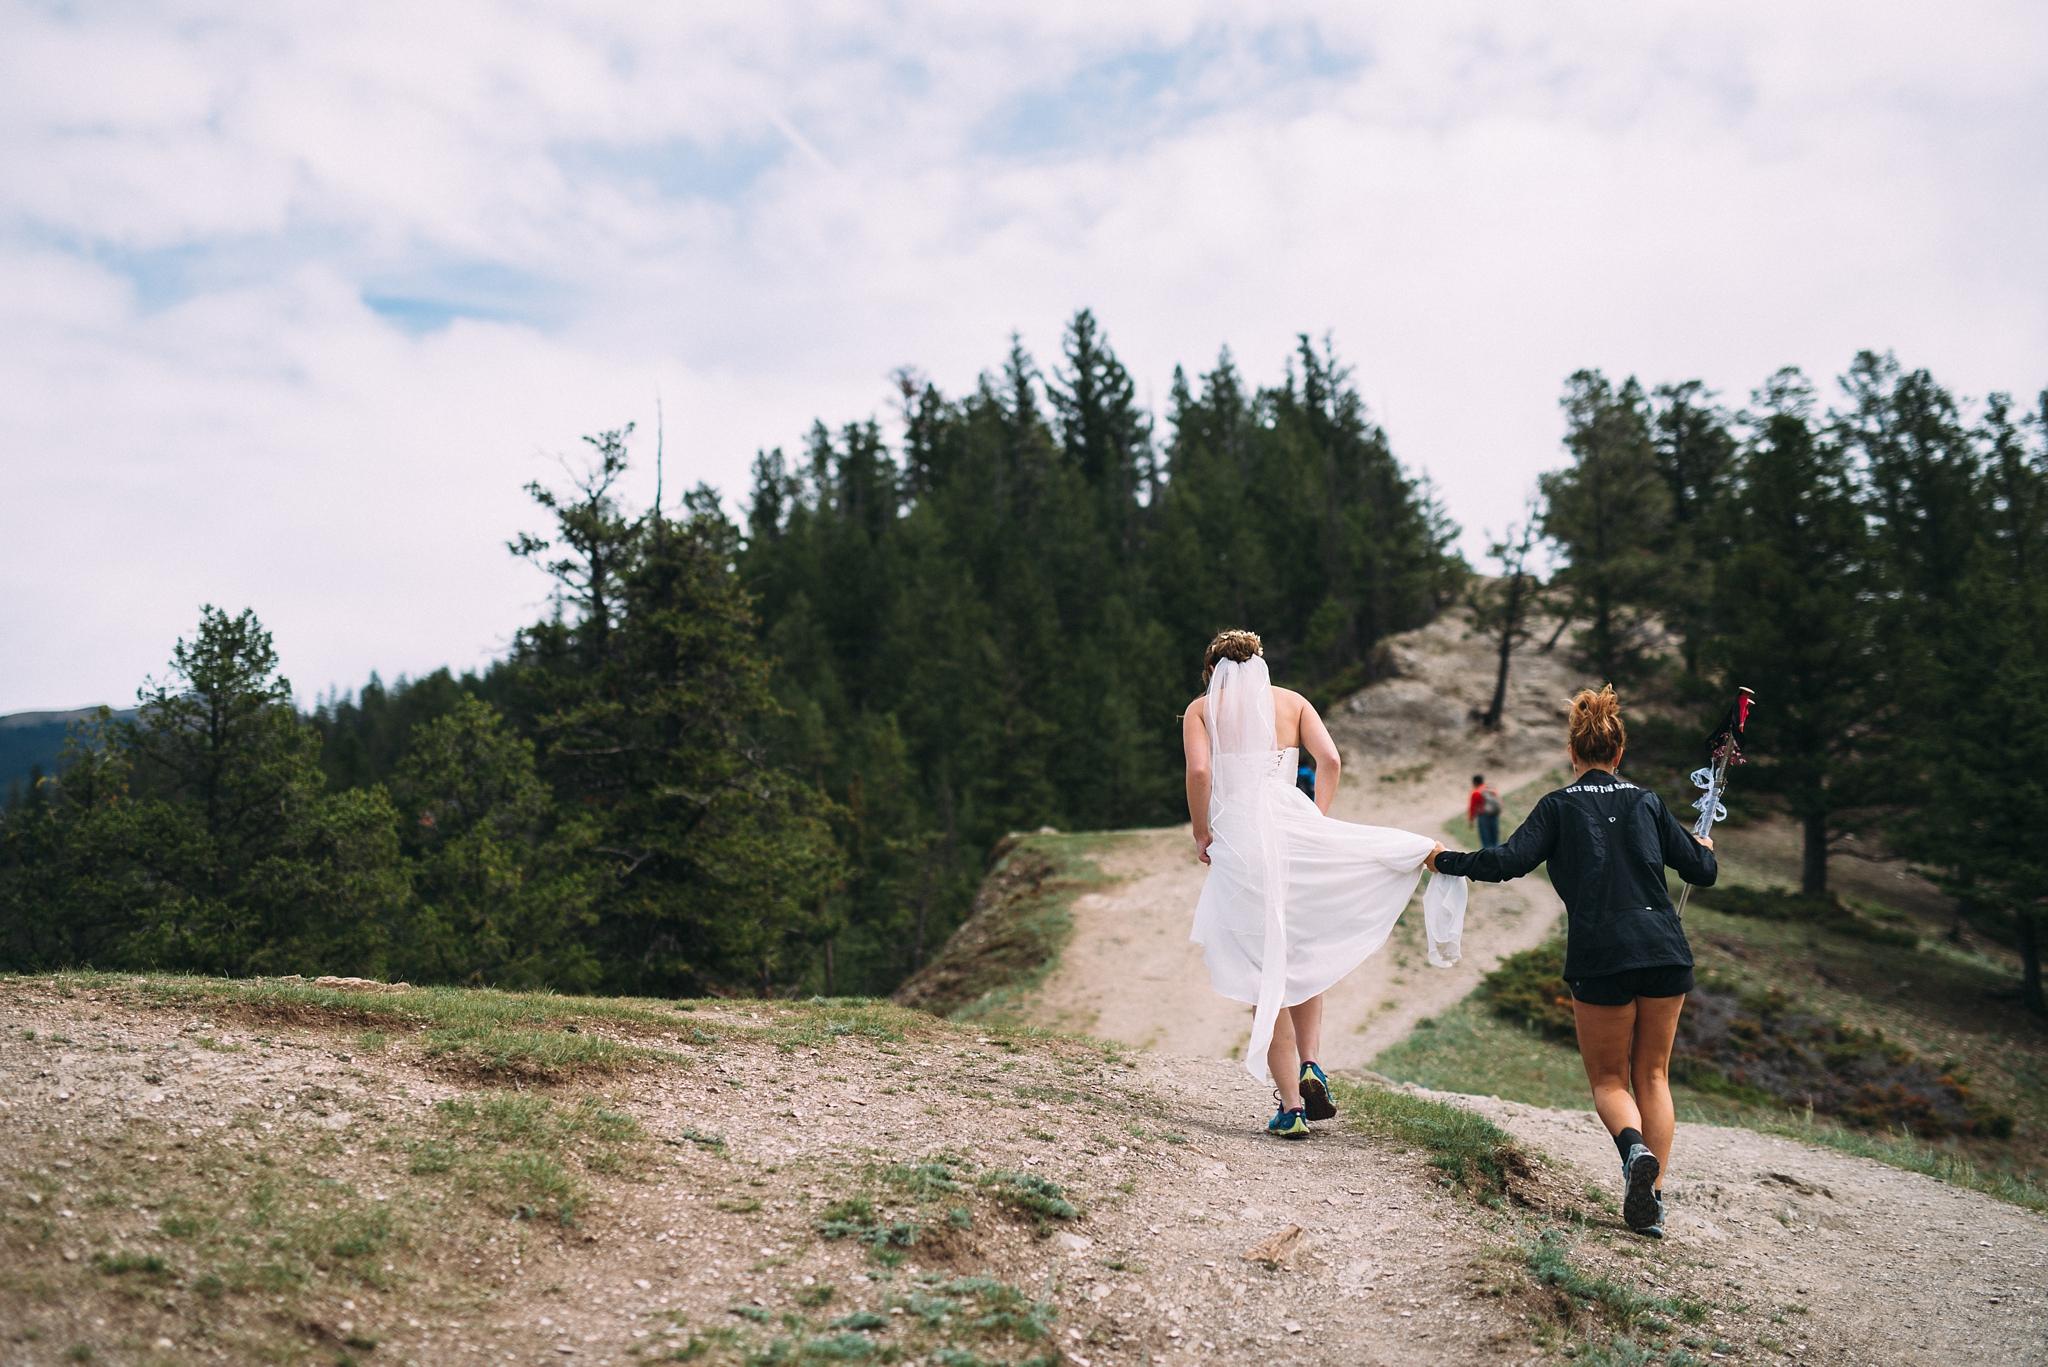 kaihla_tonai_intimate_wedding_elopement_photographer_2467